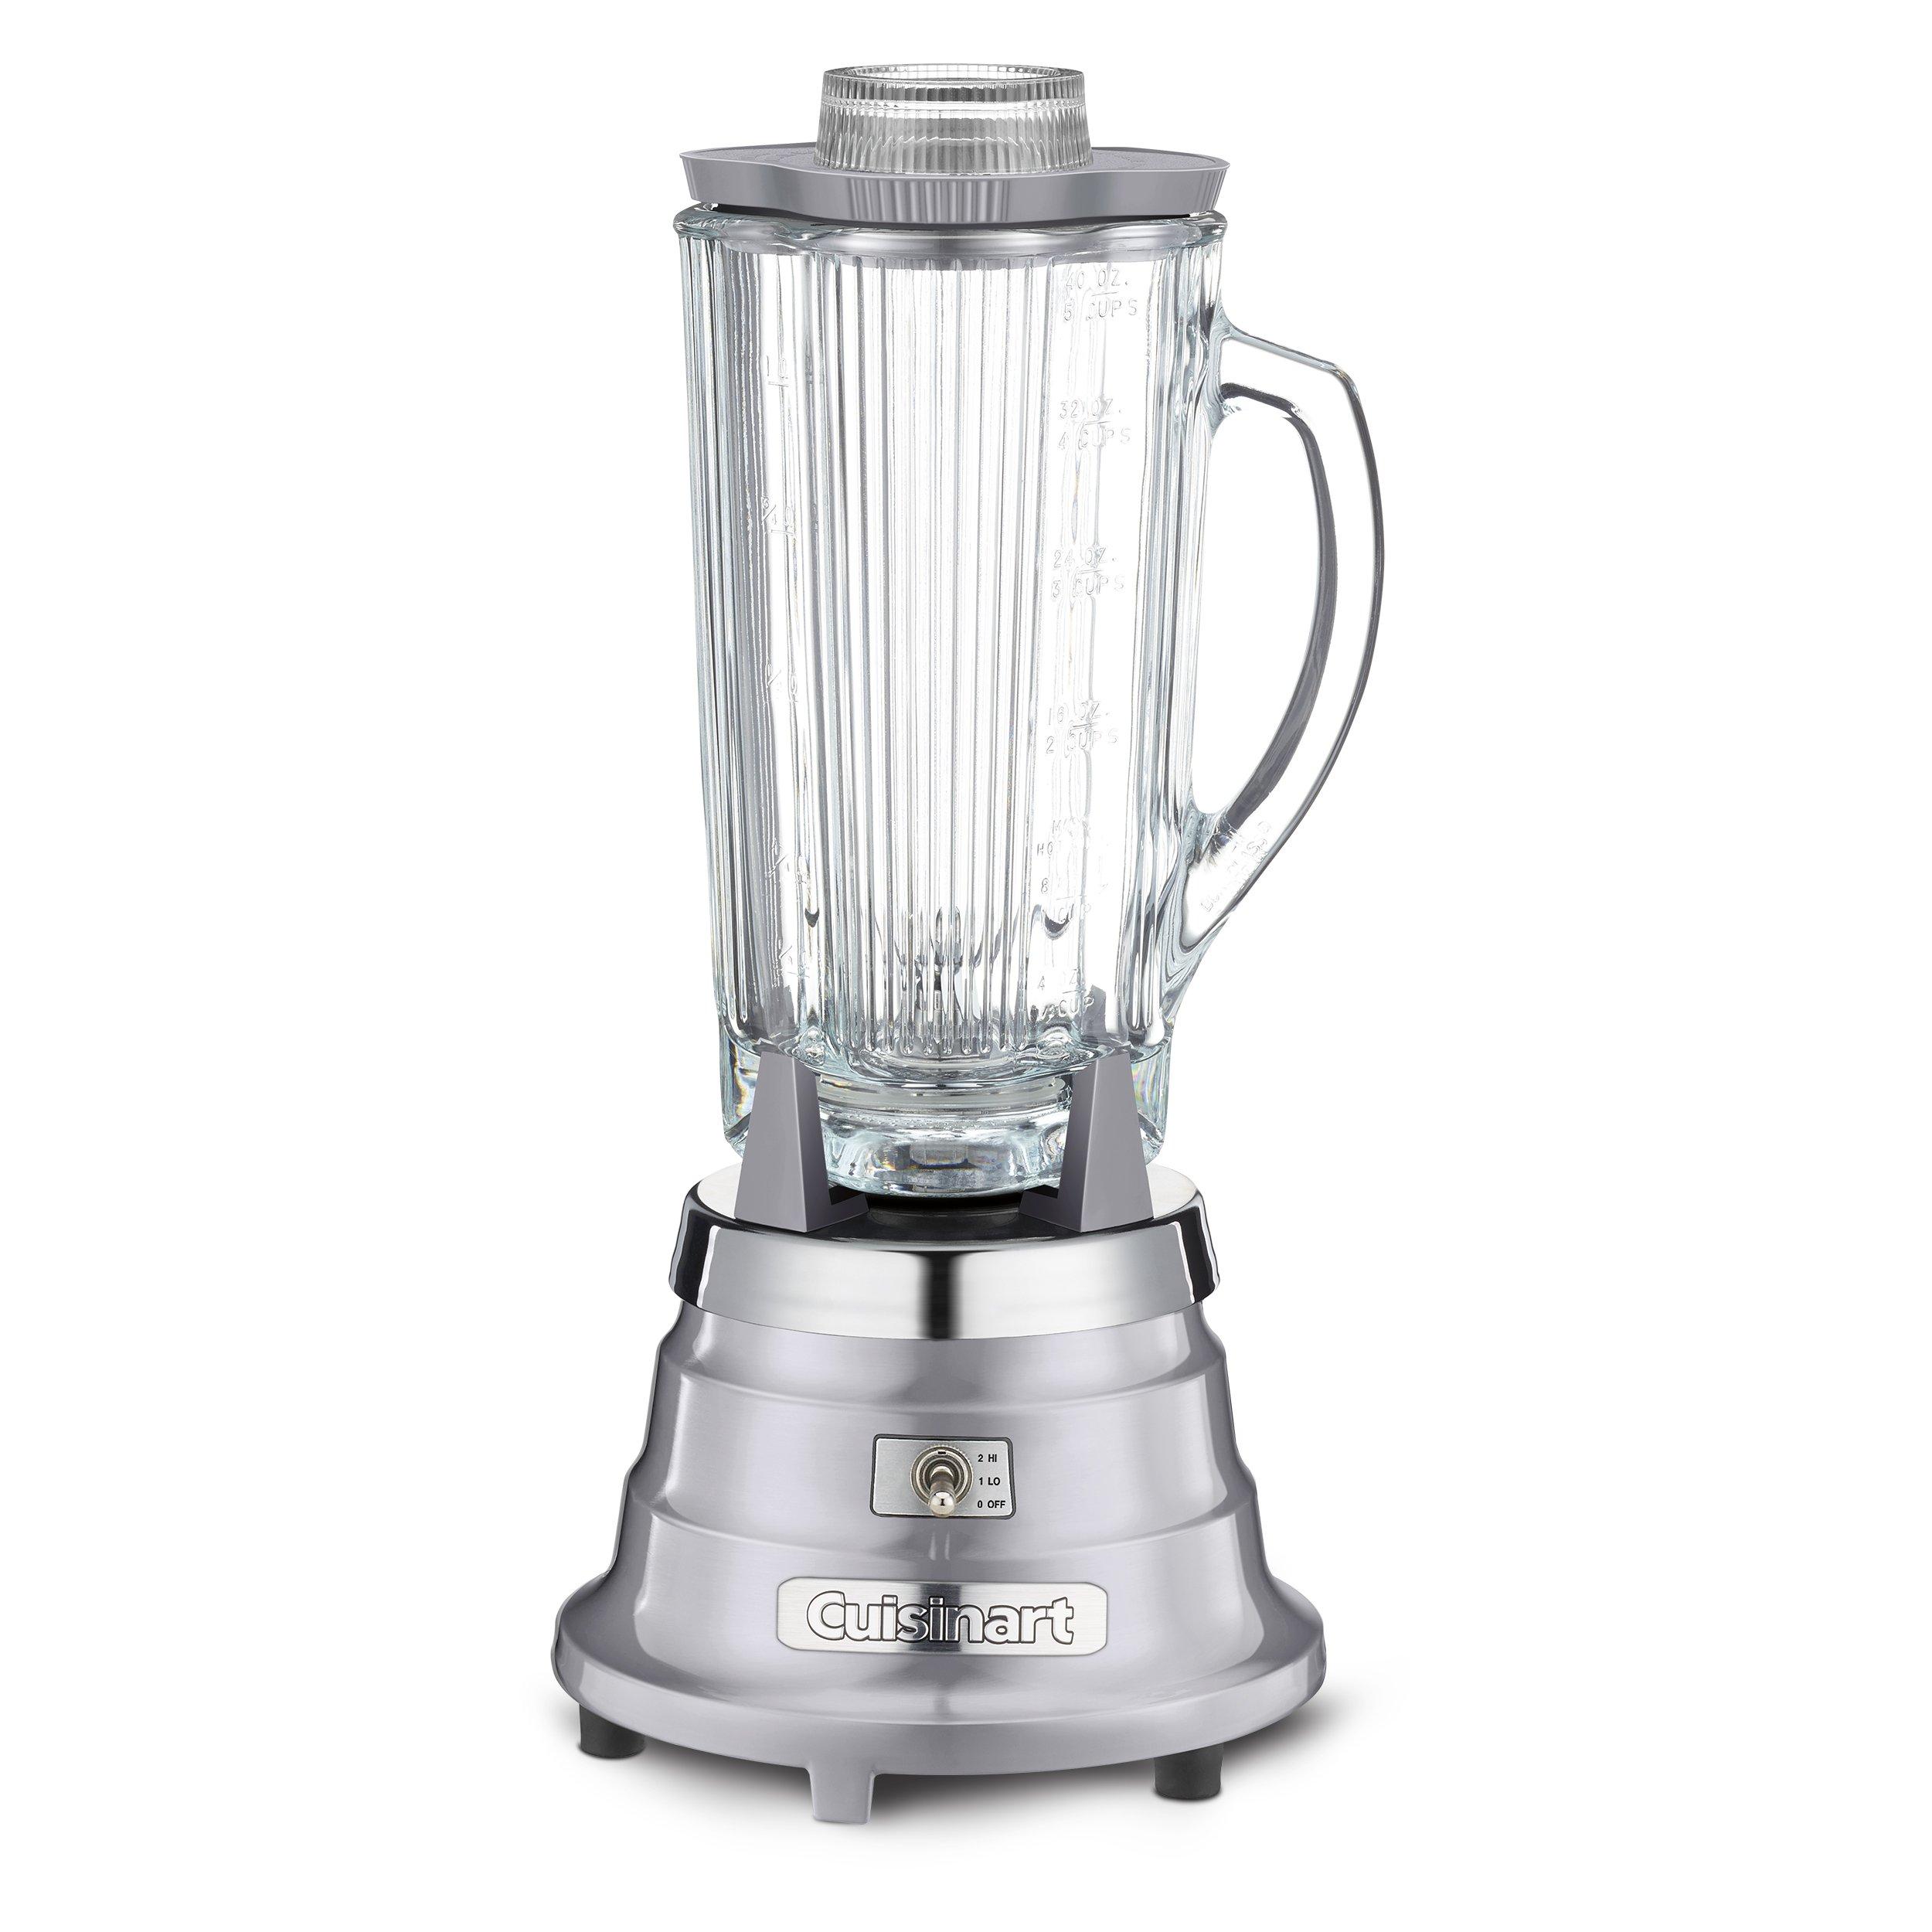 Cuisinart CBB-550SV Classic Blender, Silver